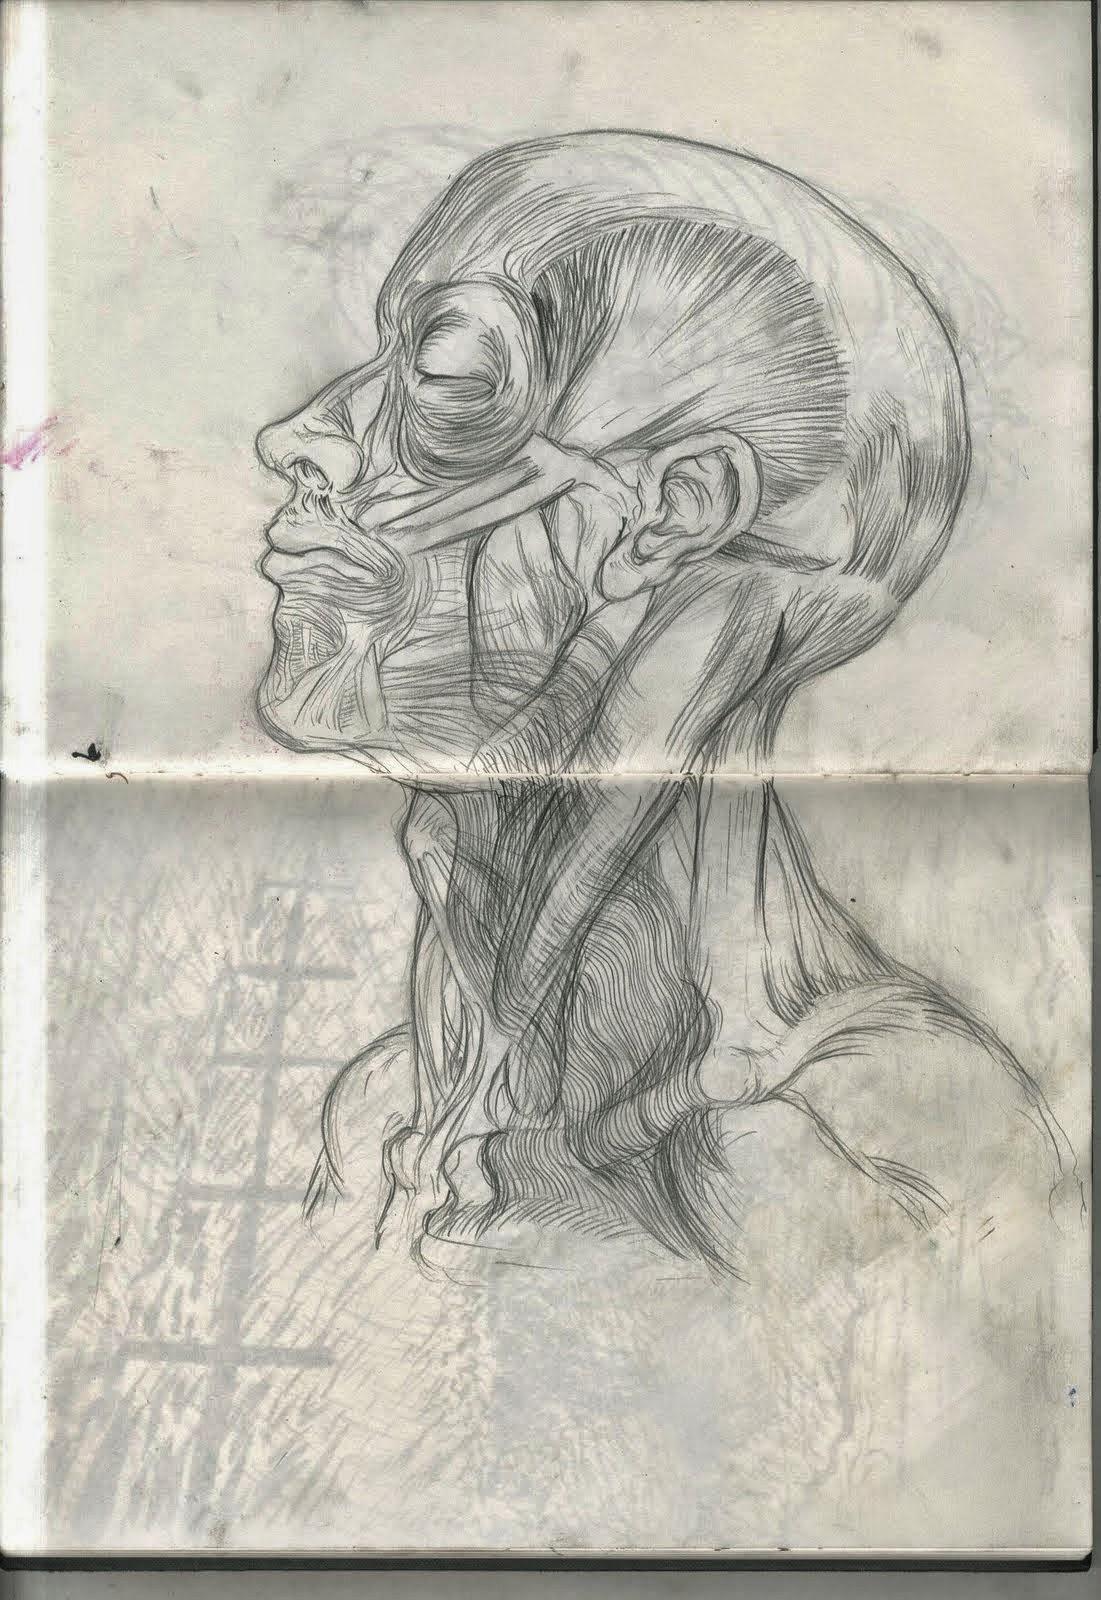 Sarah Simblet Anatomy For The Artist Choice Image - human body anatomy